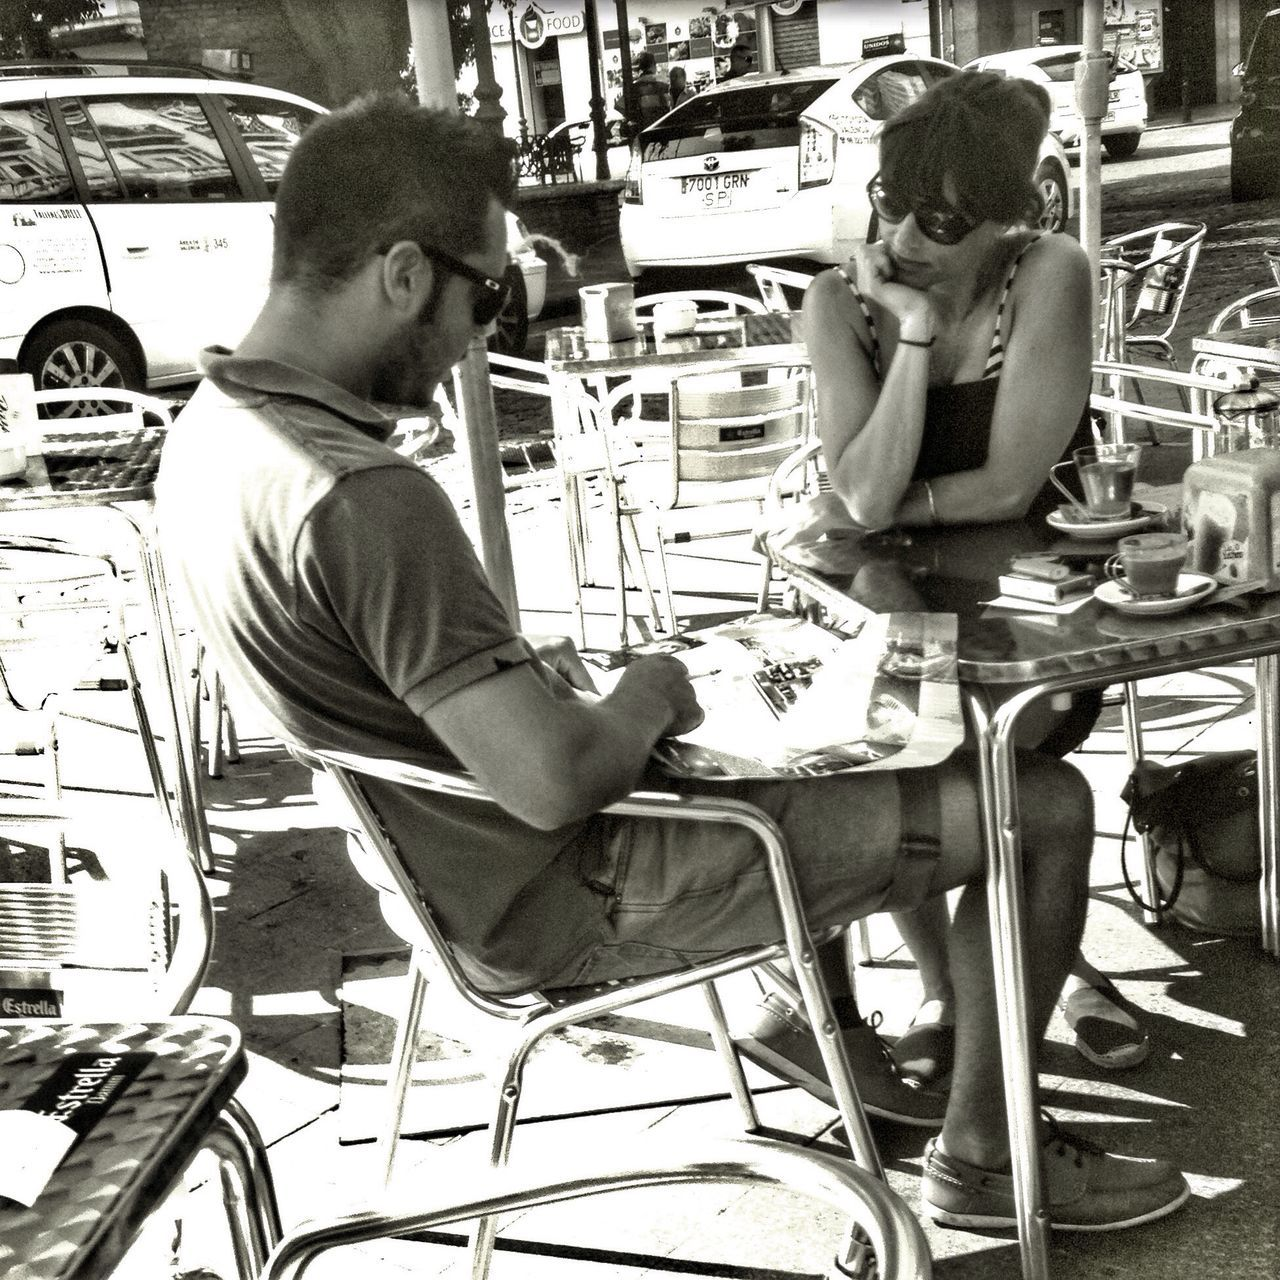 Streetphotography Blackandwhite Shootermag Hipstamatic